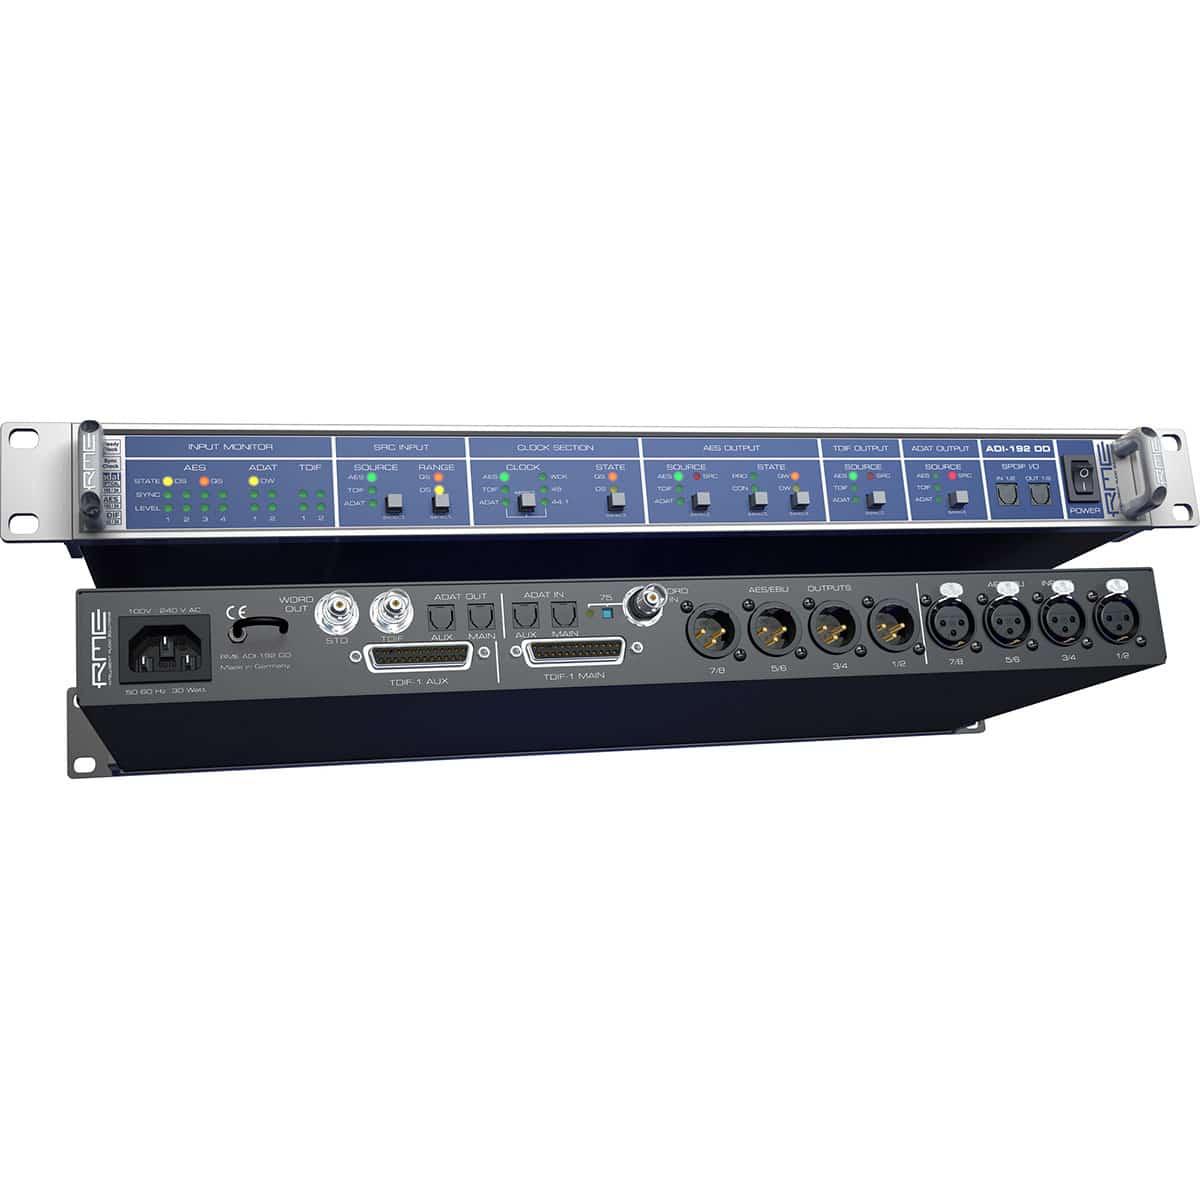 RME ADI 192 DD 06 Convertitori Audio, Pro Audio, Audio Digitale